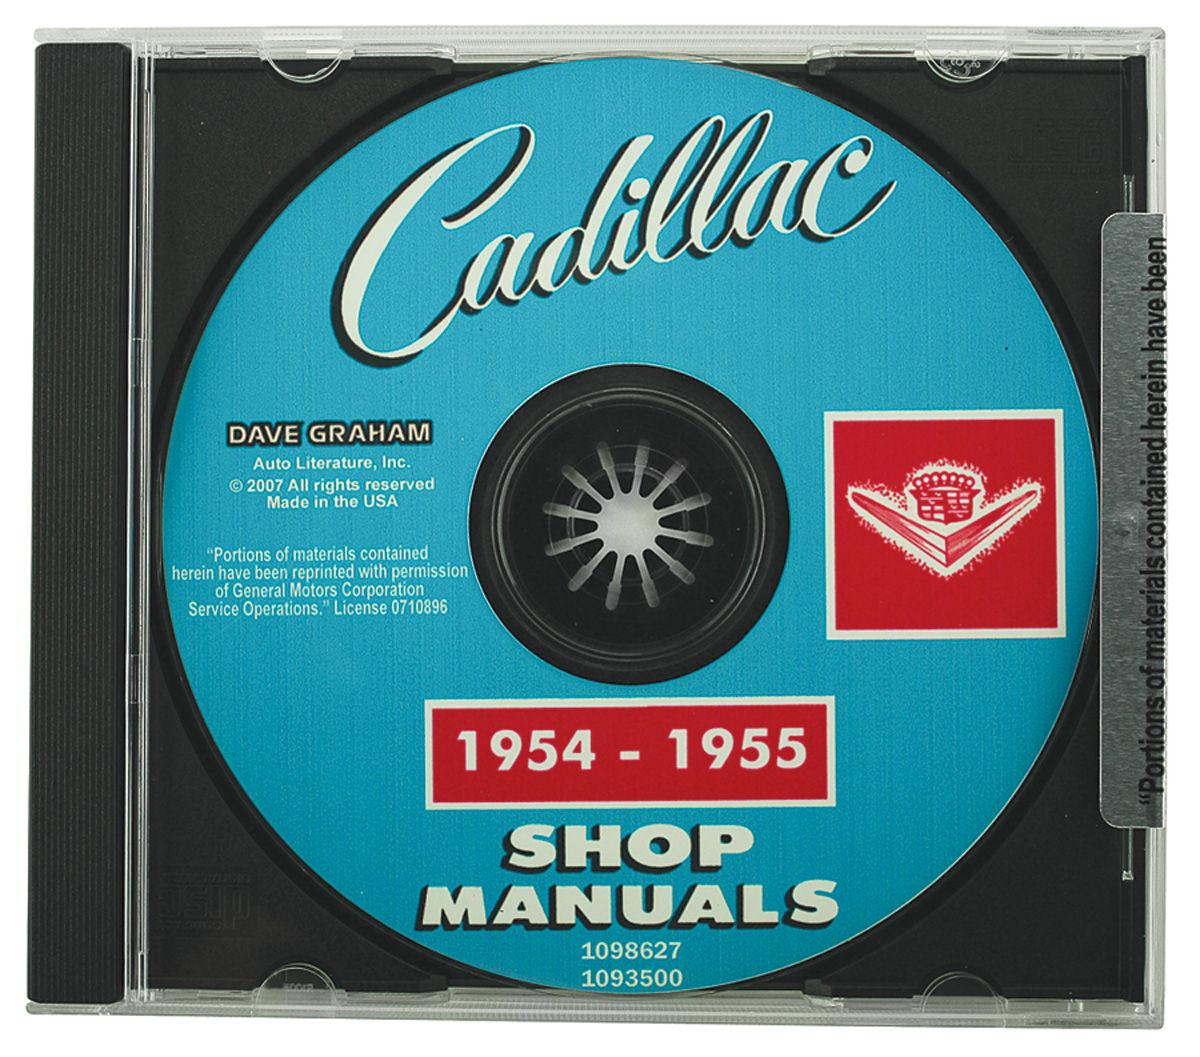 Factory Shop Manuals, CD-ROM, 1942-47 Cadillac